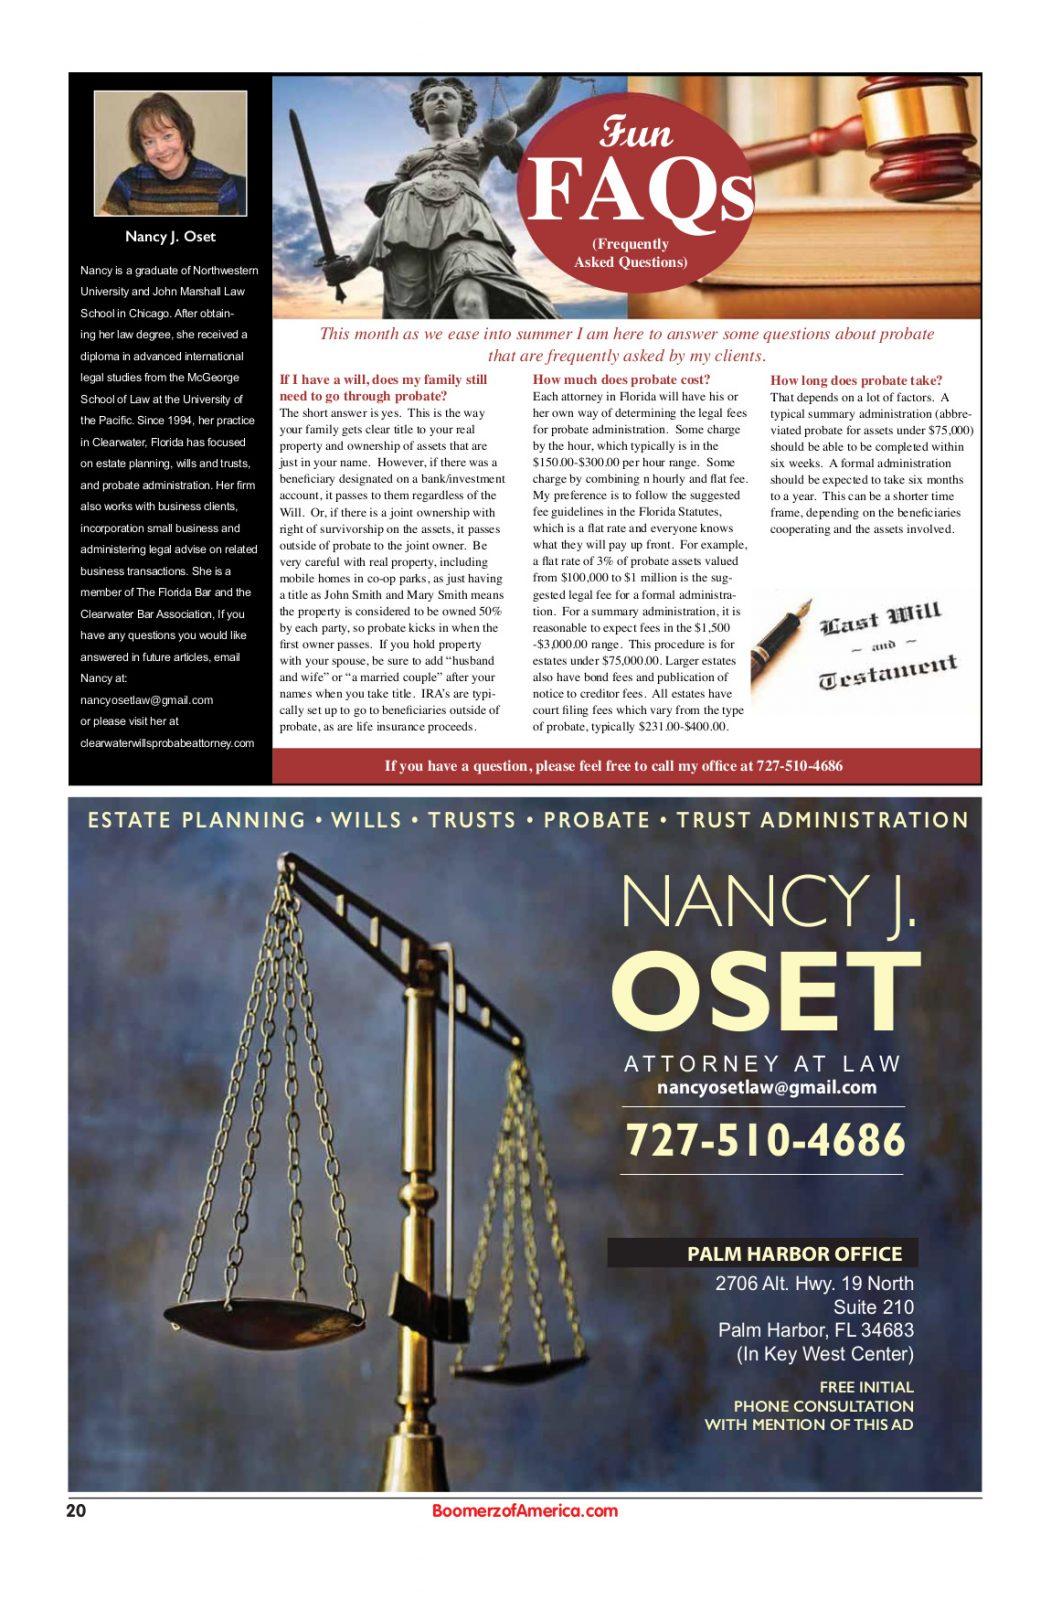 Nancy Oset - Wills-Trusts-Probate-Estate Planning 05-19